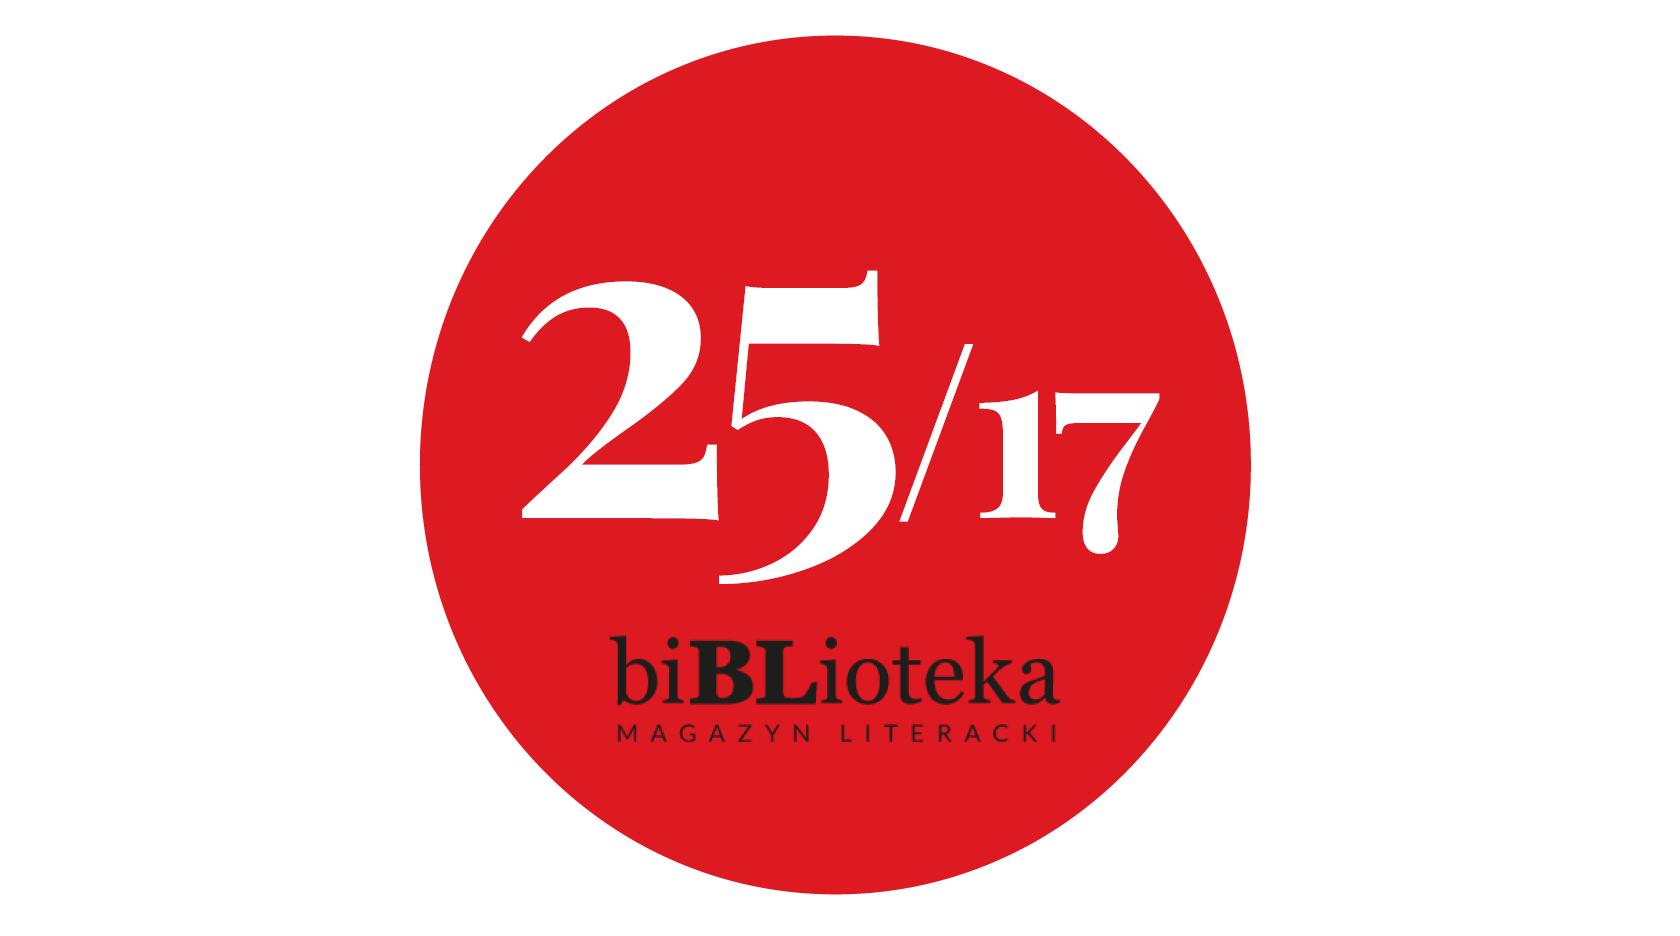 BL Img 2017.12.19 biBLioteka nr 201725_www